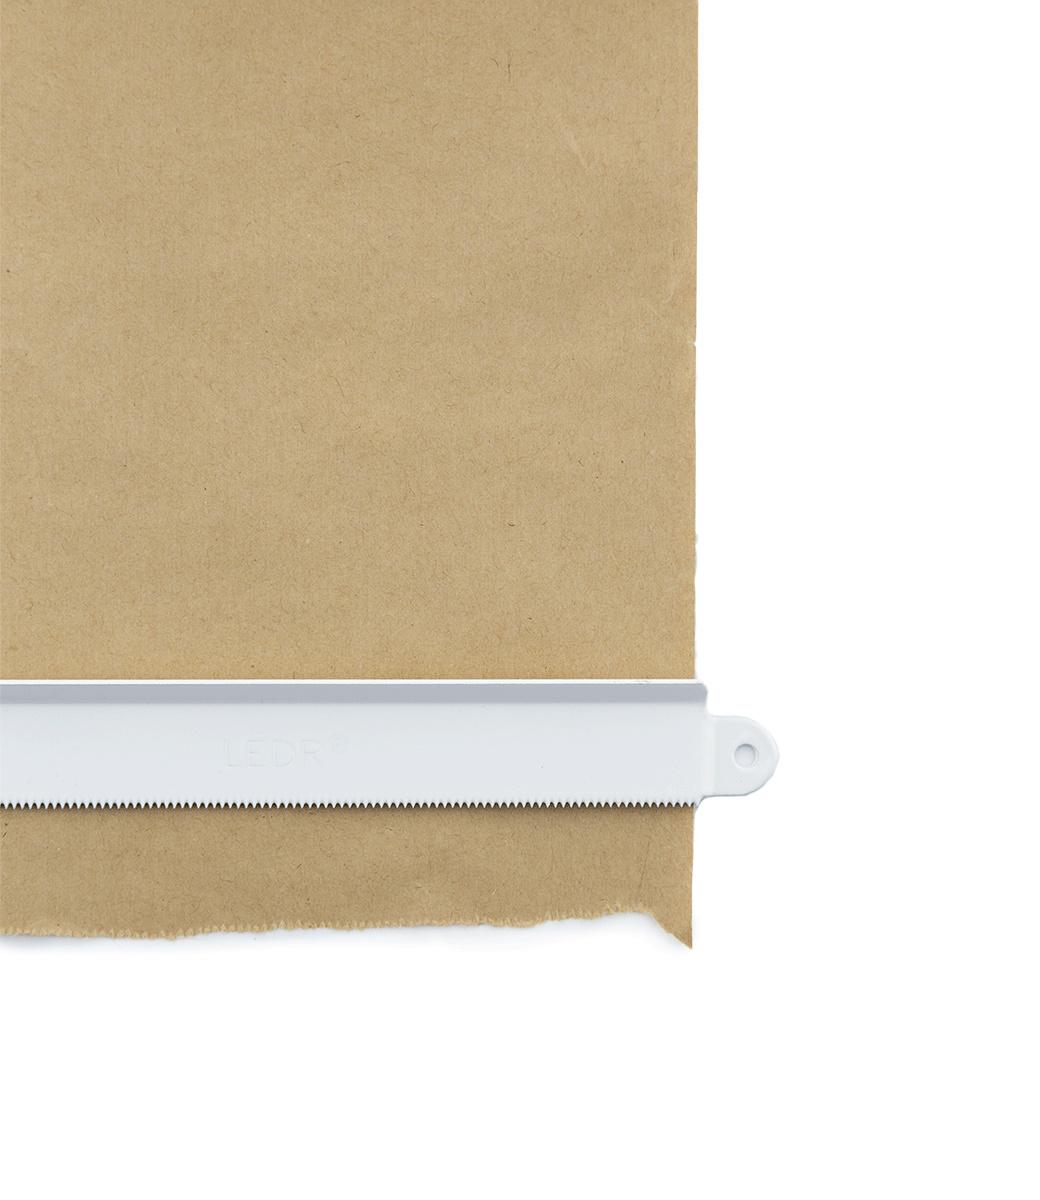 Kraft paper roller XL - White-4